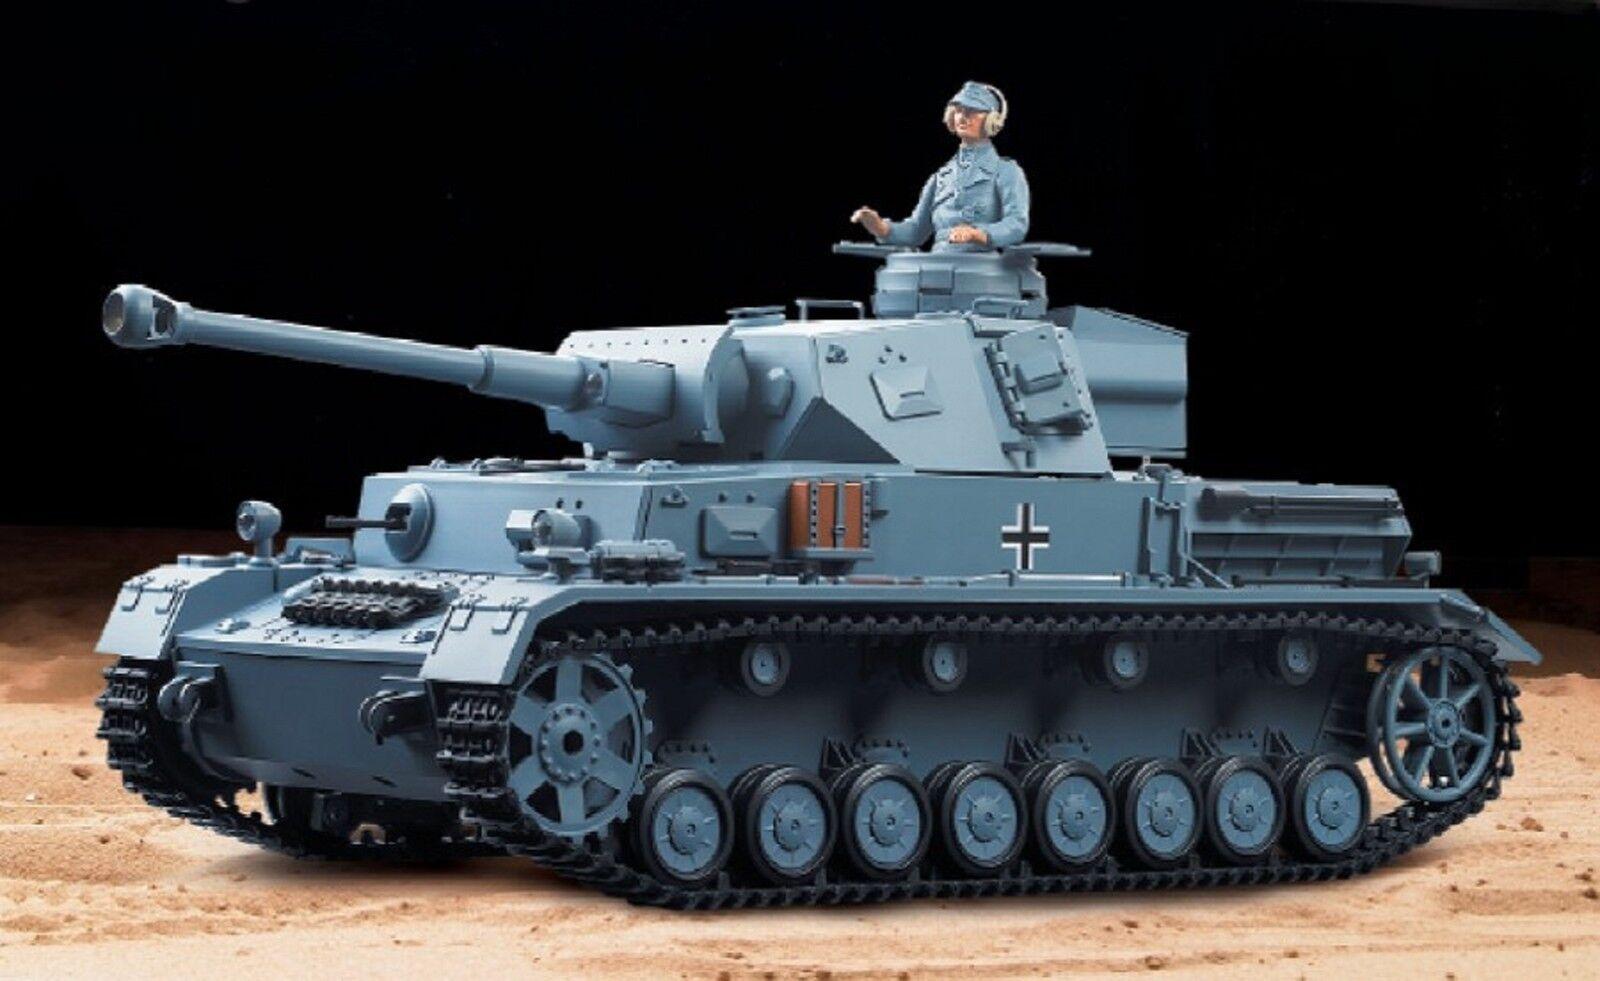 Heng Long RC Panzer carro lotta IV Esegui.f-2, 1:16, fumo, audio, ingranaggi in metallo